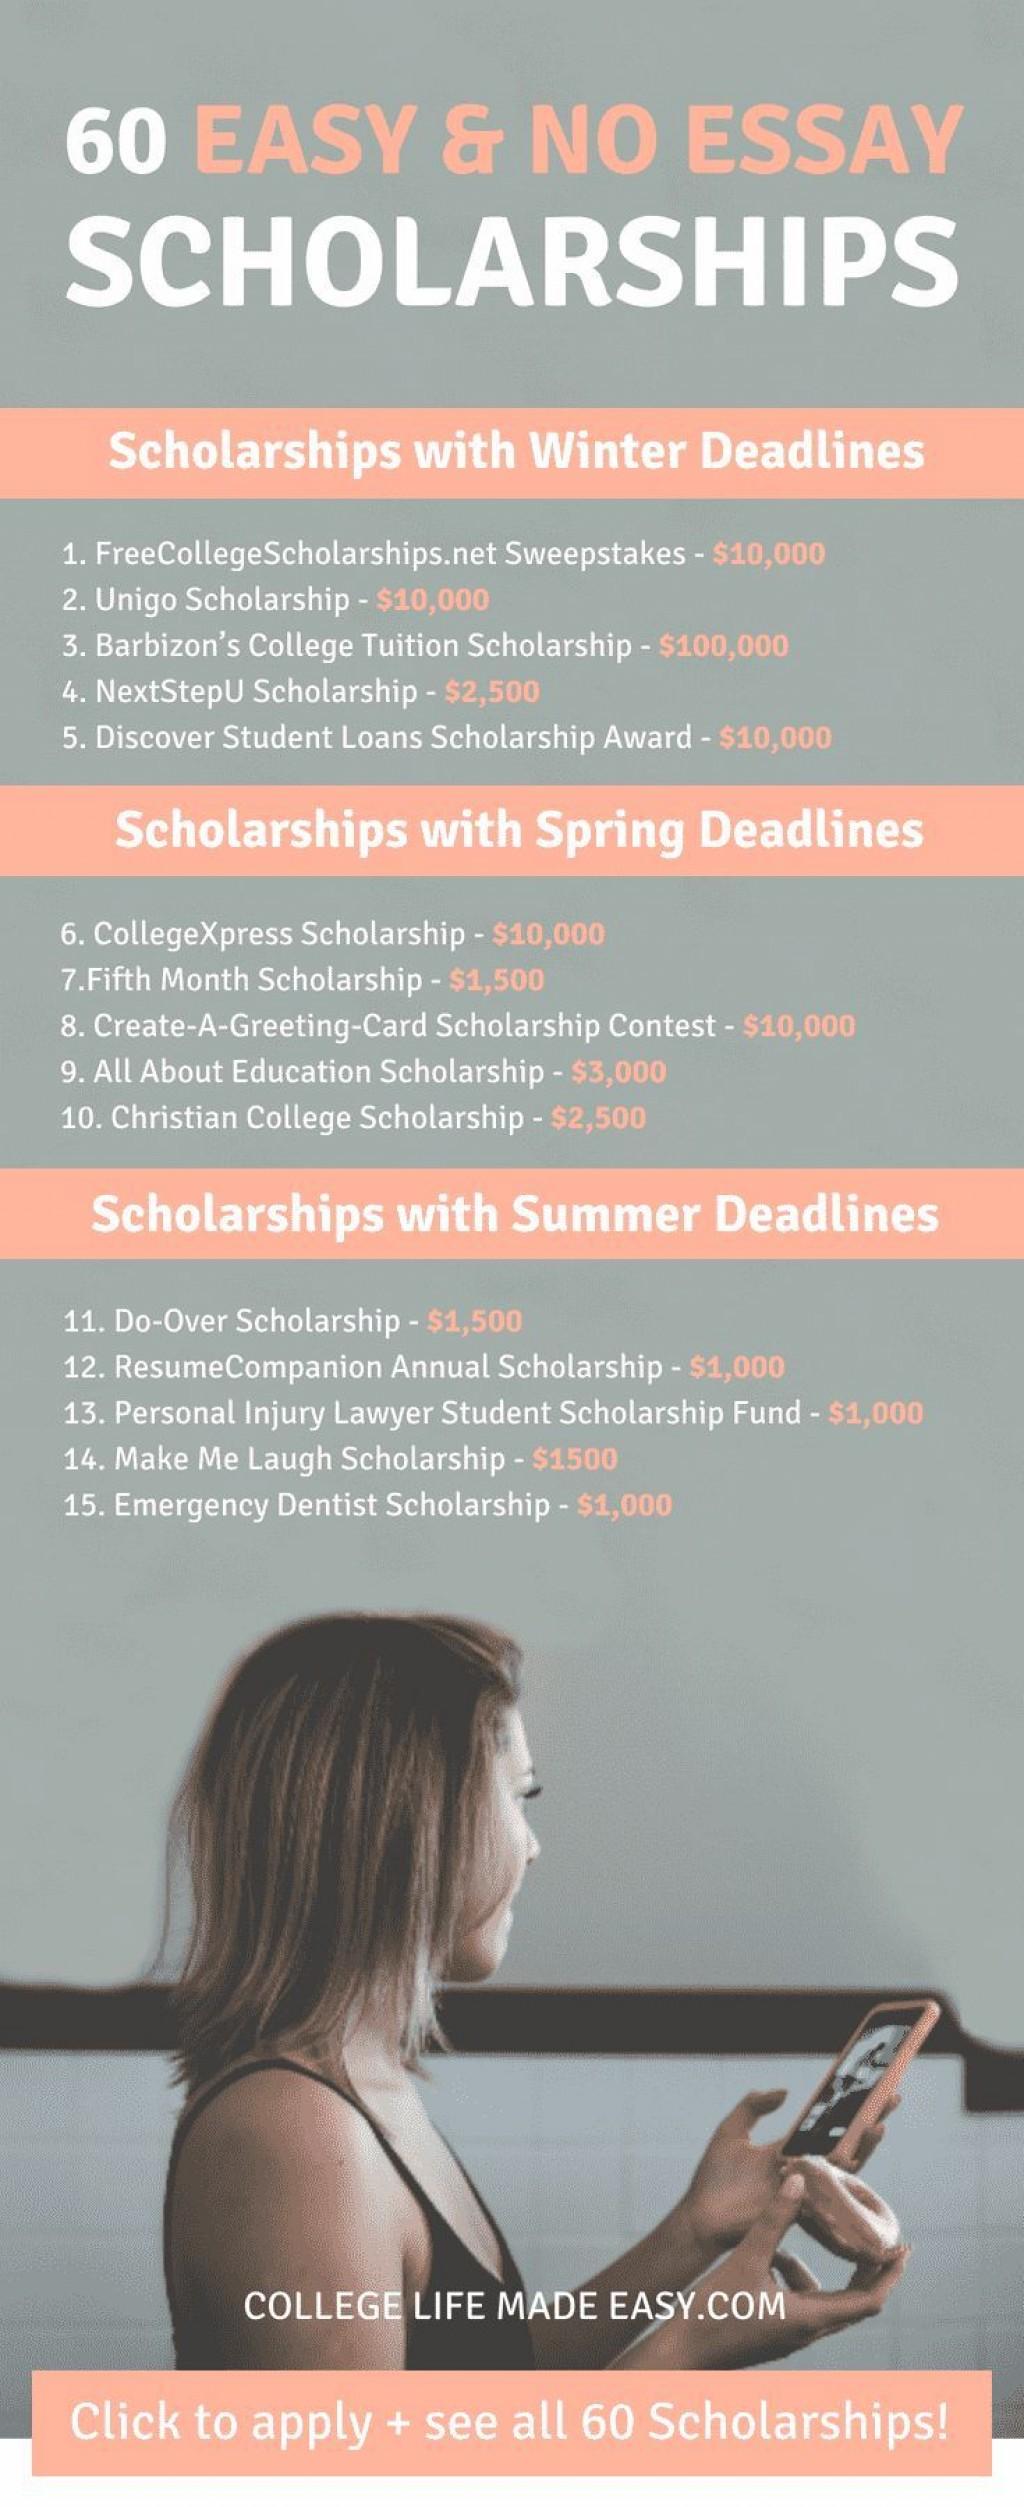 009 No Essay College Scholarships Imposing For Freshmen Easy Scholarship Legit Large